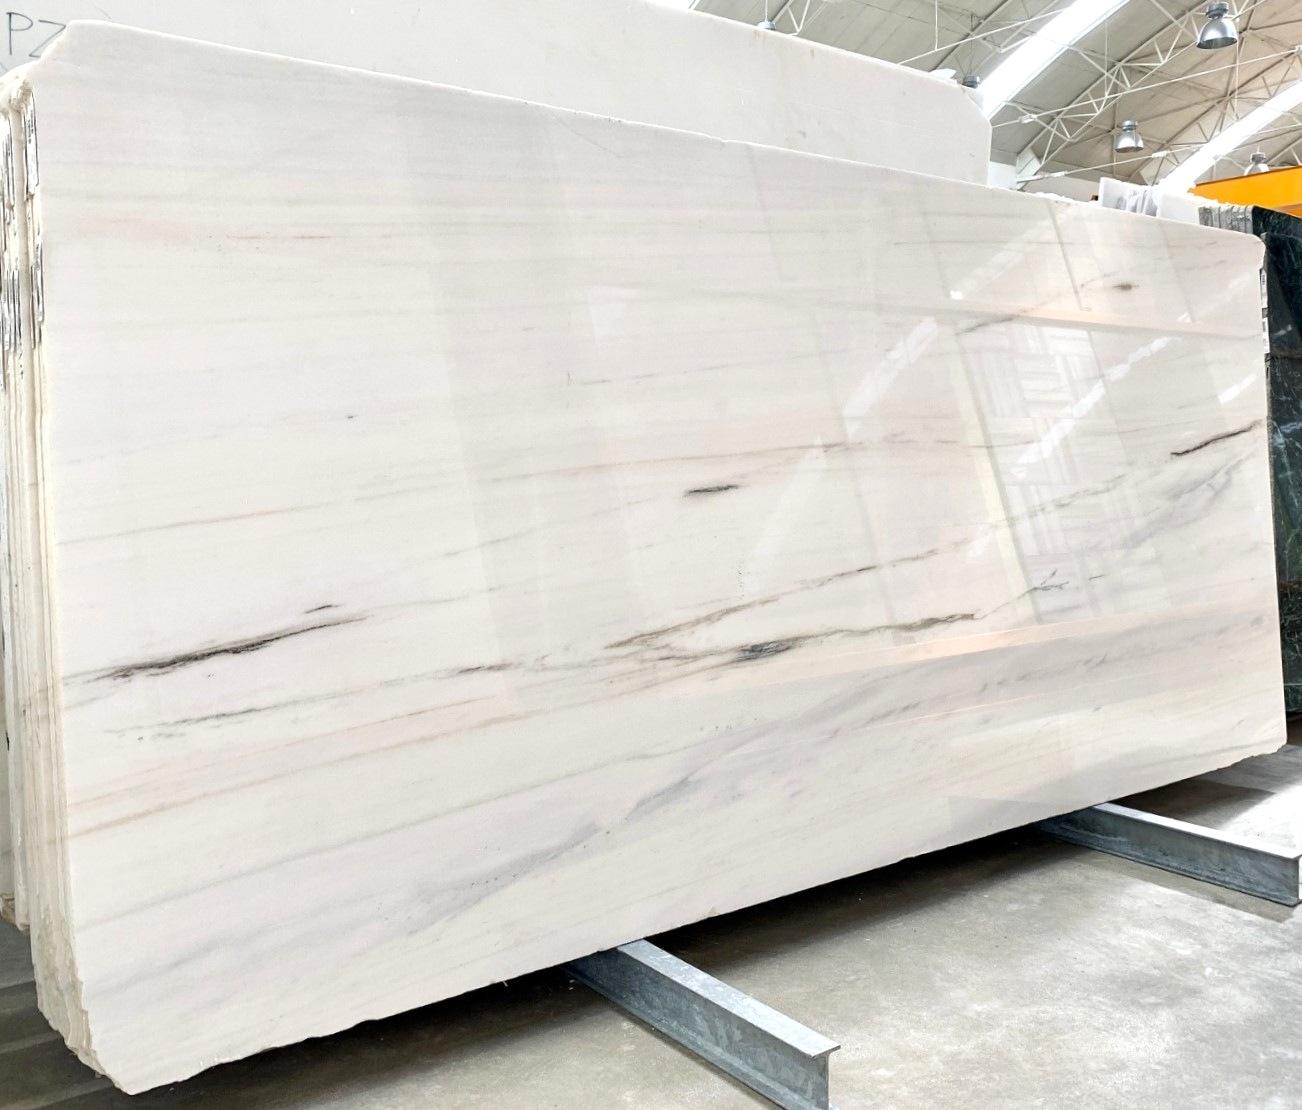 60091 303x138x3cm 22 polished slabs 90